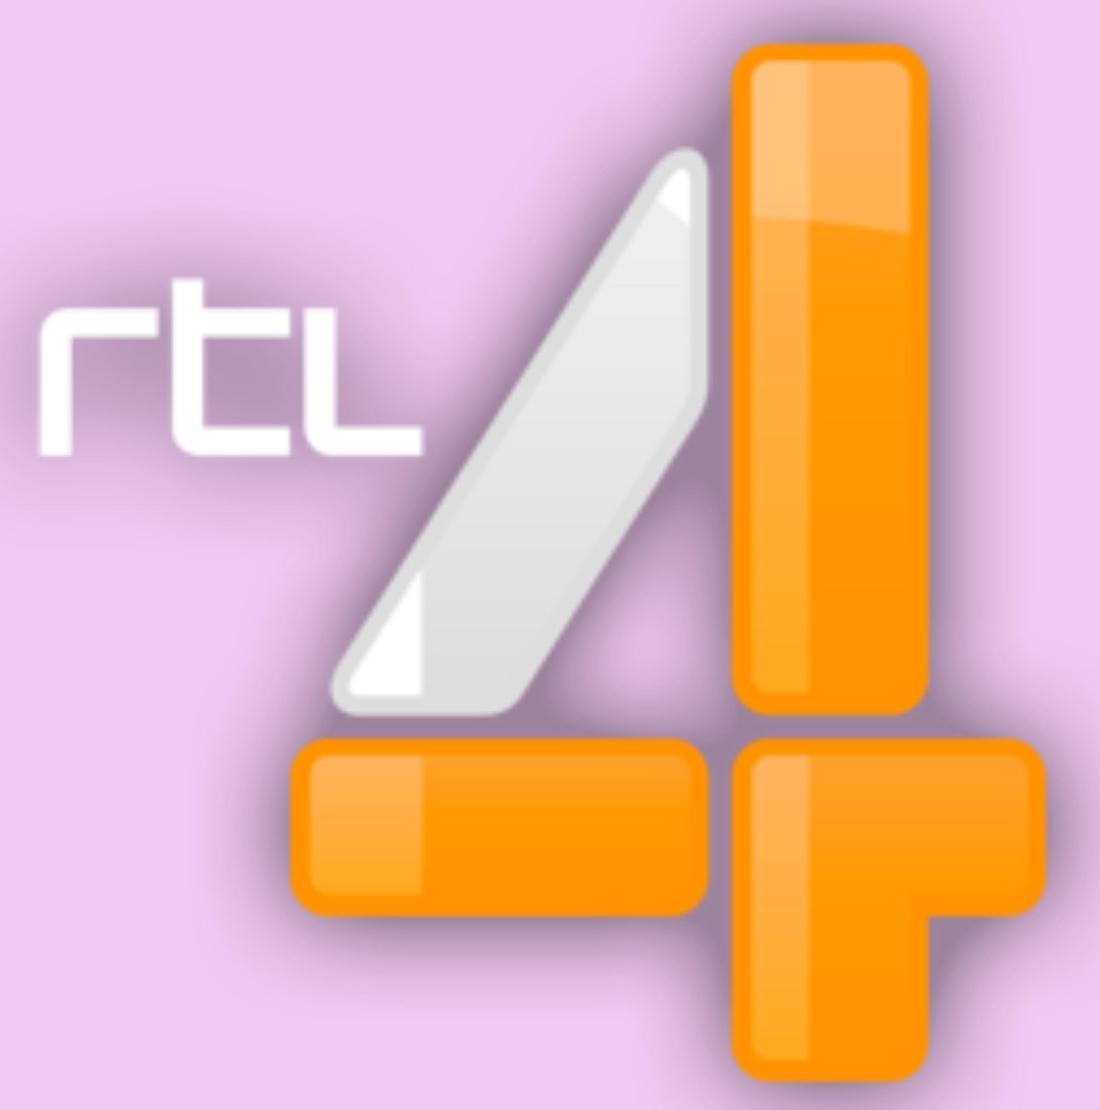 Puzzlefun bekend van RTL4